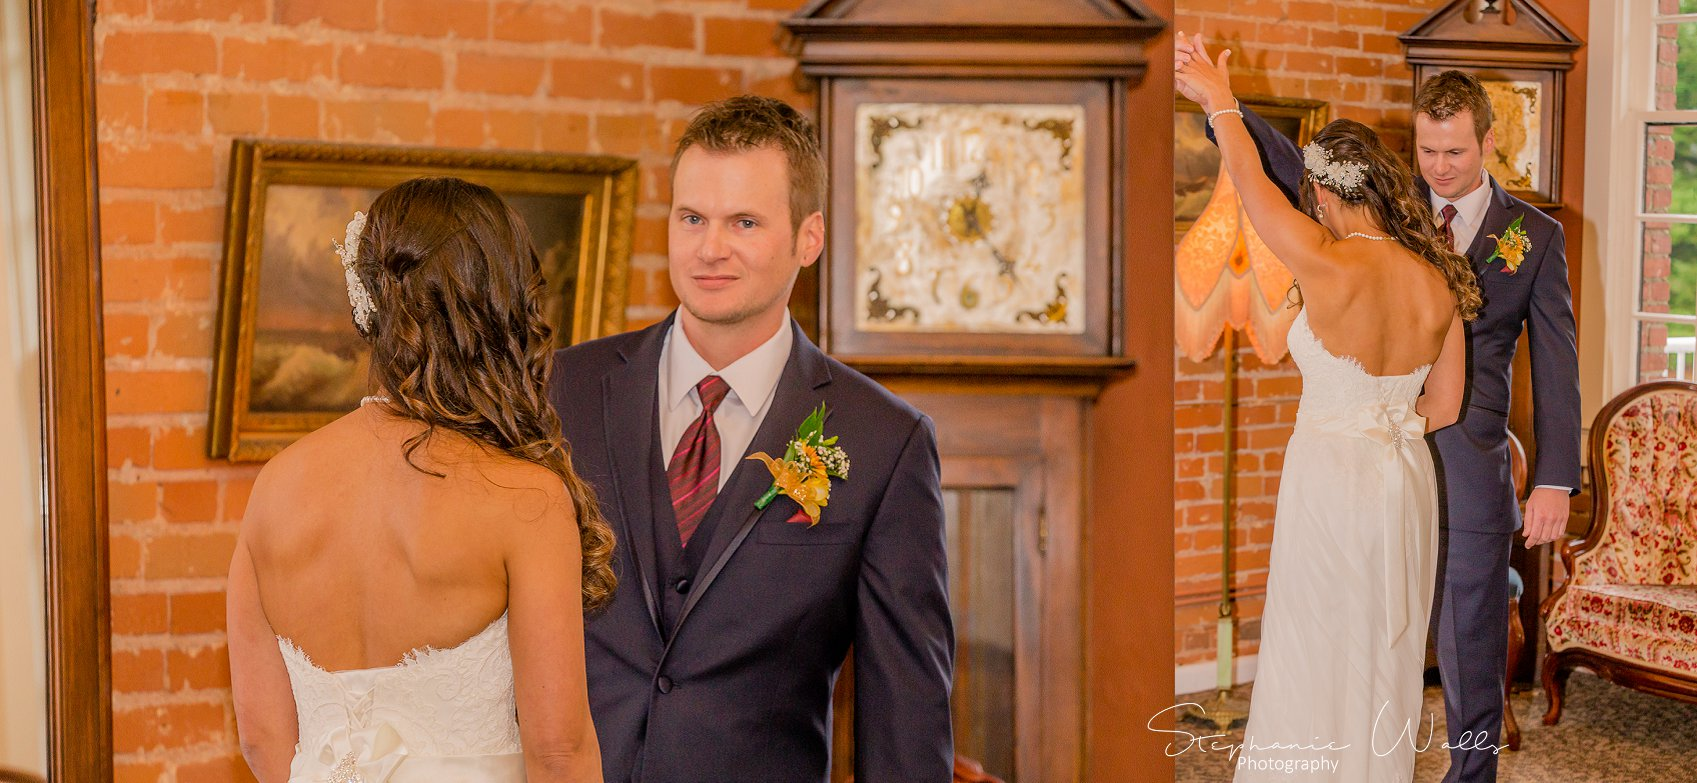 1st look Bridals 026 KK & Zack   Hollywood Schoolhouse Wedding   Woodinville, Wa Wedding Photographer